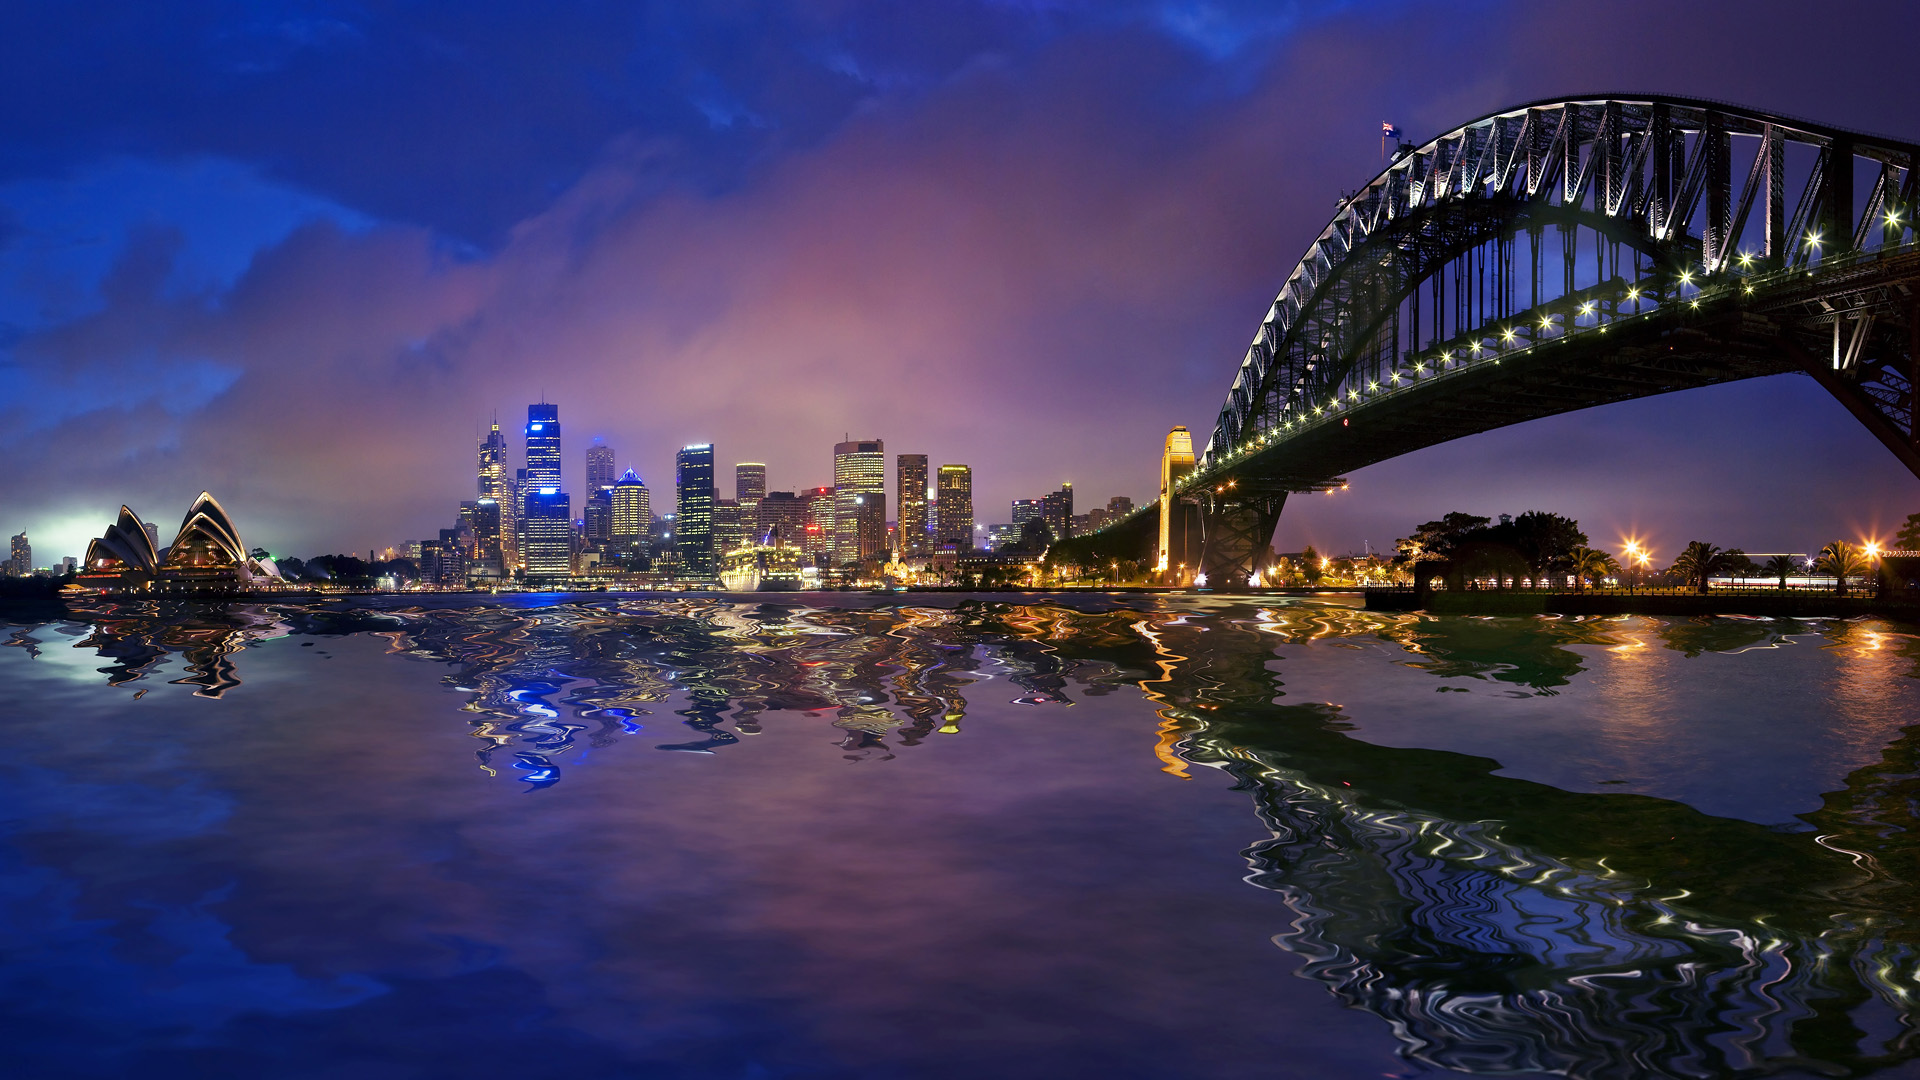 Sydney Harbour Bridge Hd Wallpaper Background Image 1920x1080